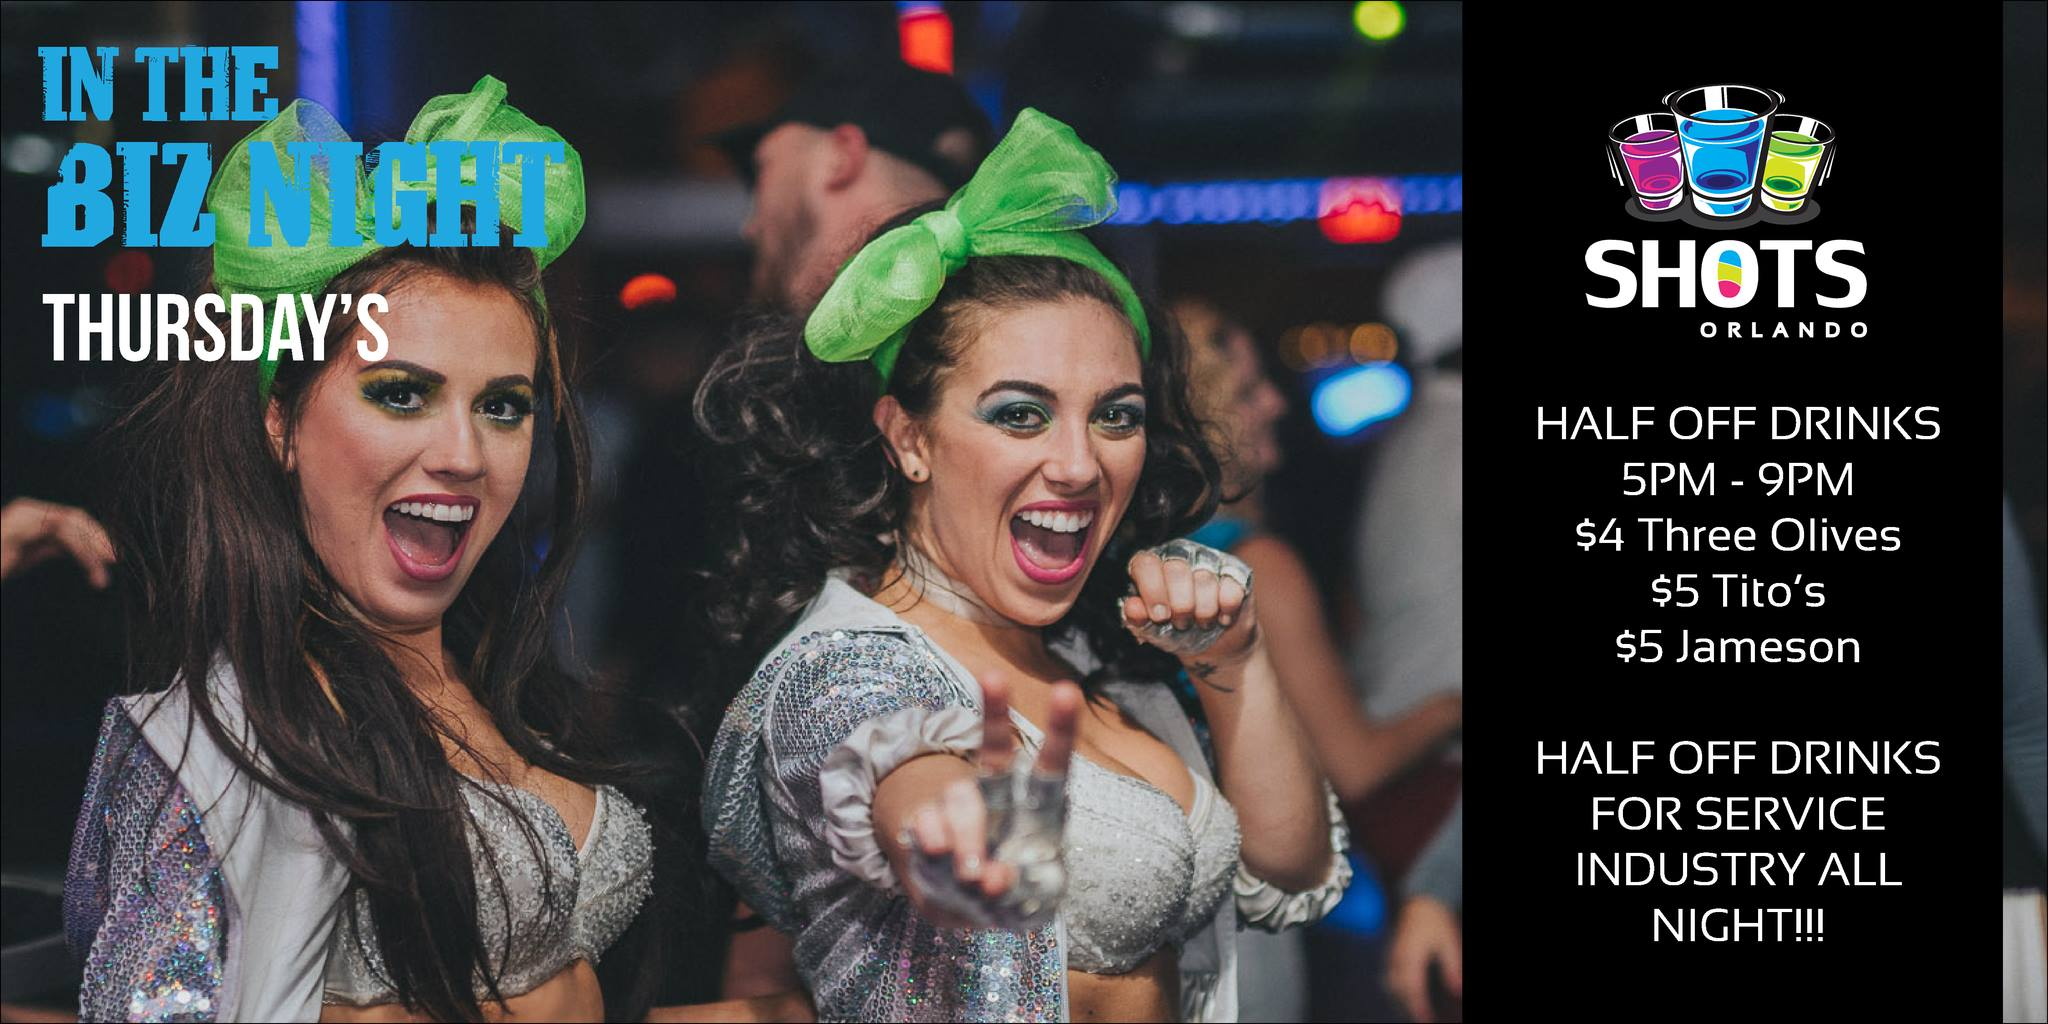 Orlando Nightlife Events and Concert Tickets OrlandoClubNights